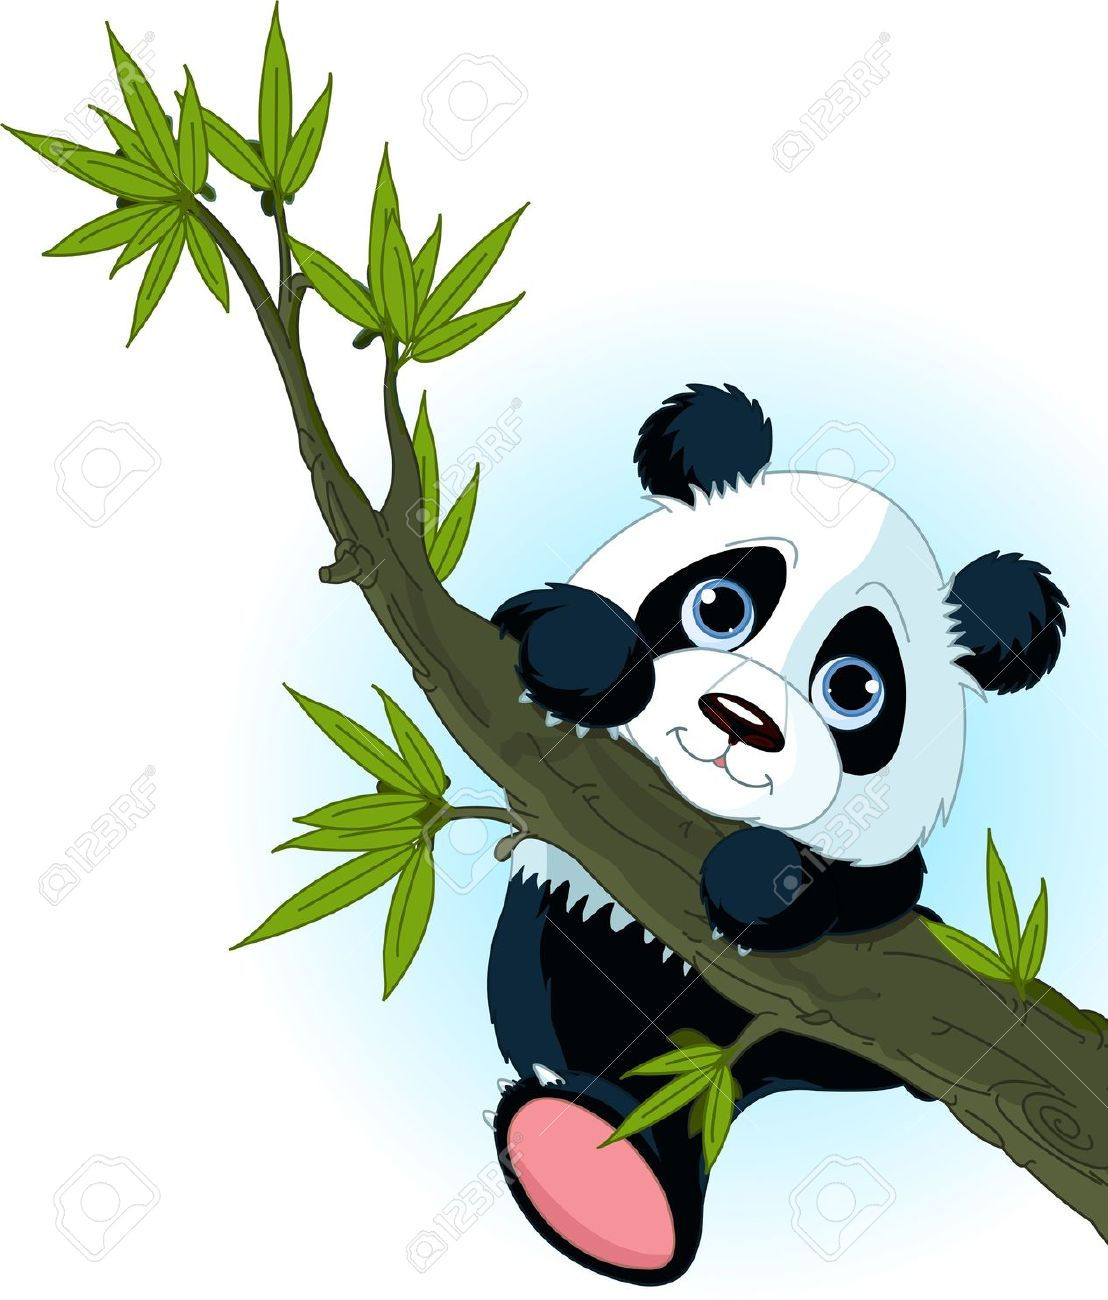 Very Cute Giant Panda Climbing Tree Royalty Free Cliparts, Vectors.